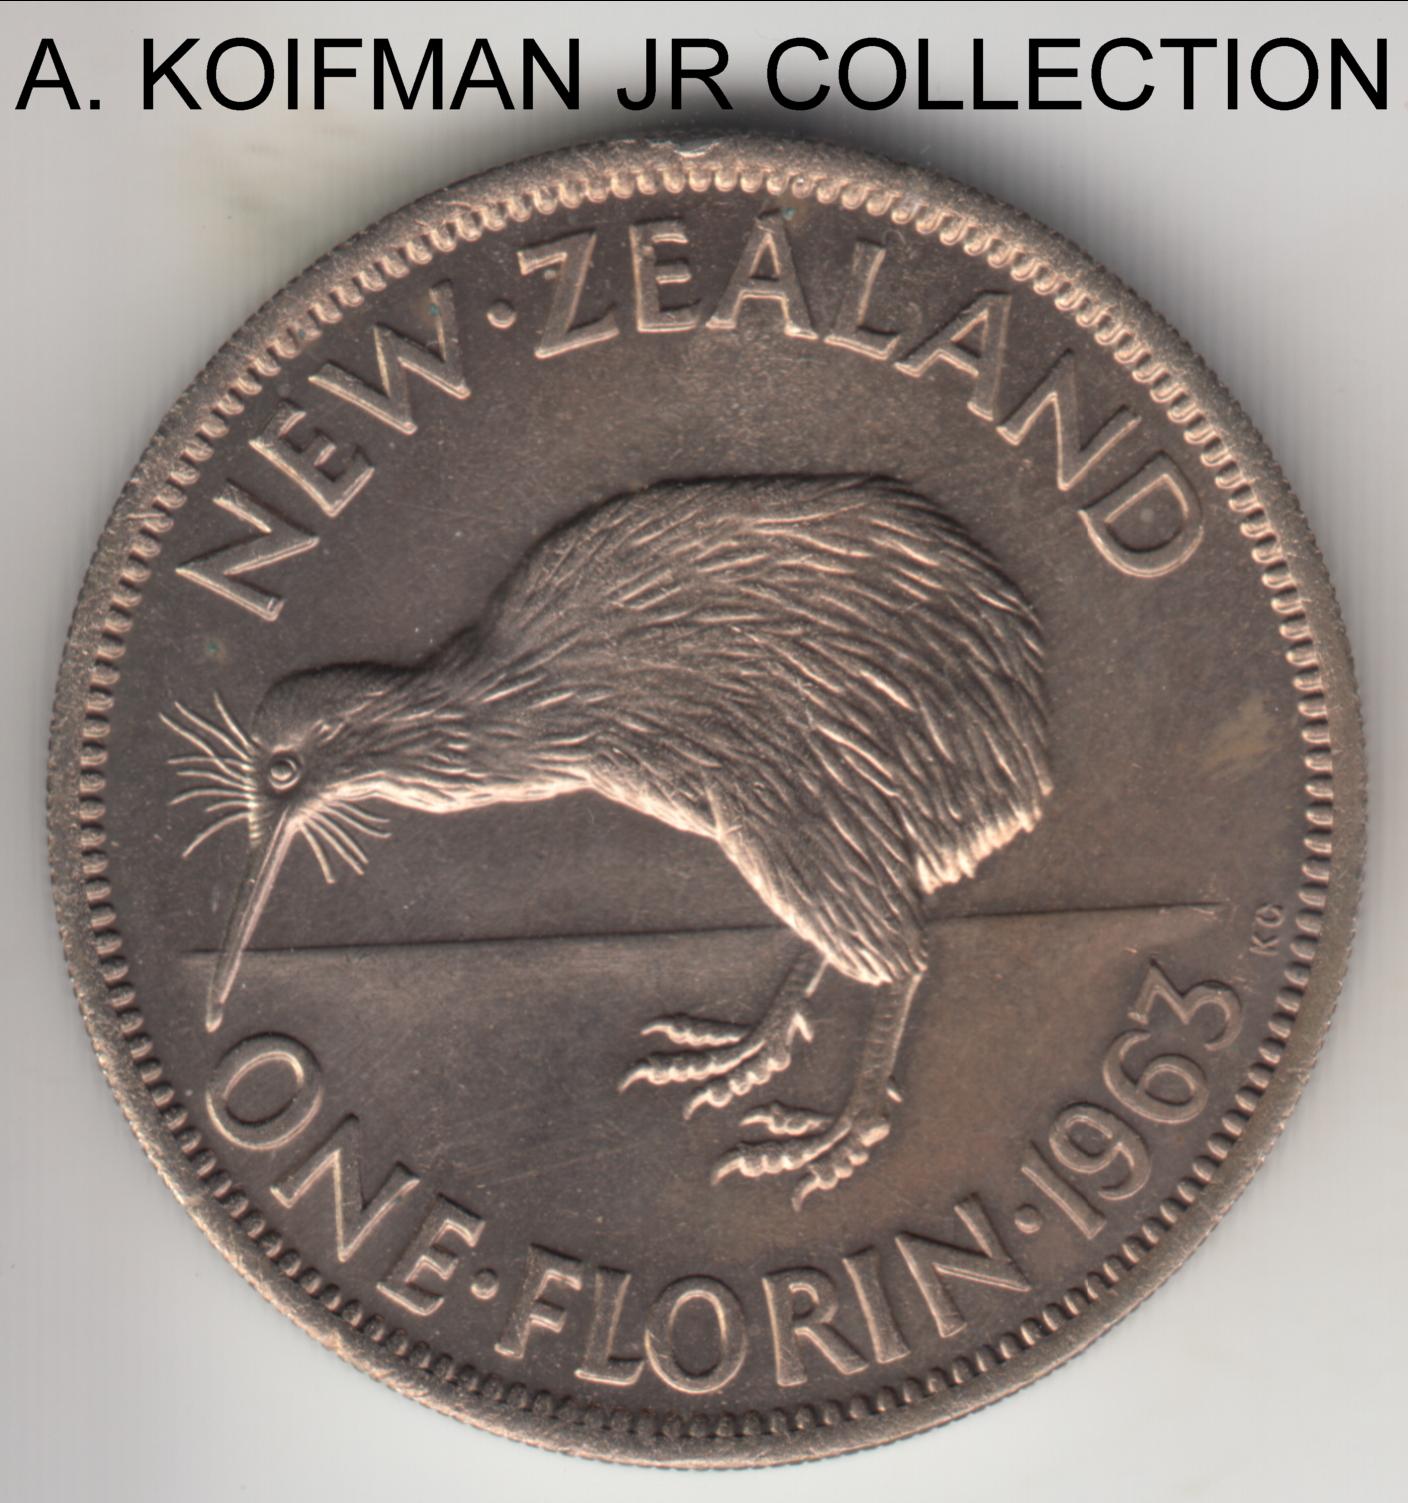 New Zealand 50 Cents 1968 KM#31 32 34-37 20 10 5 2 17 Coin Mint Specimen Set.